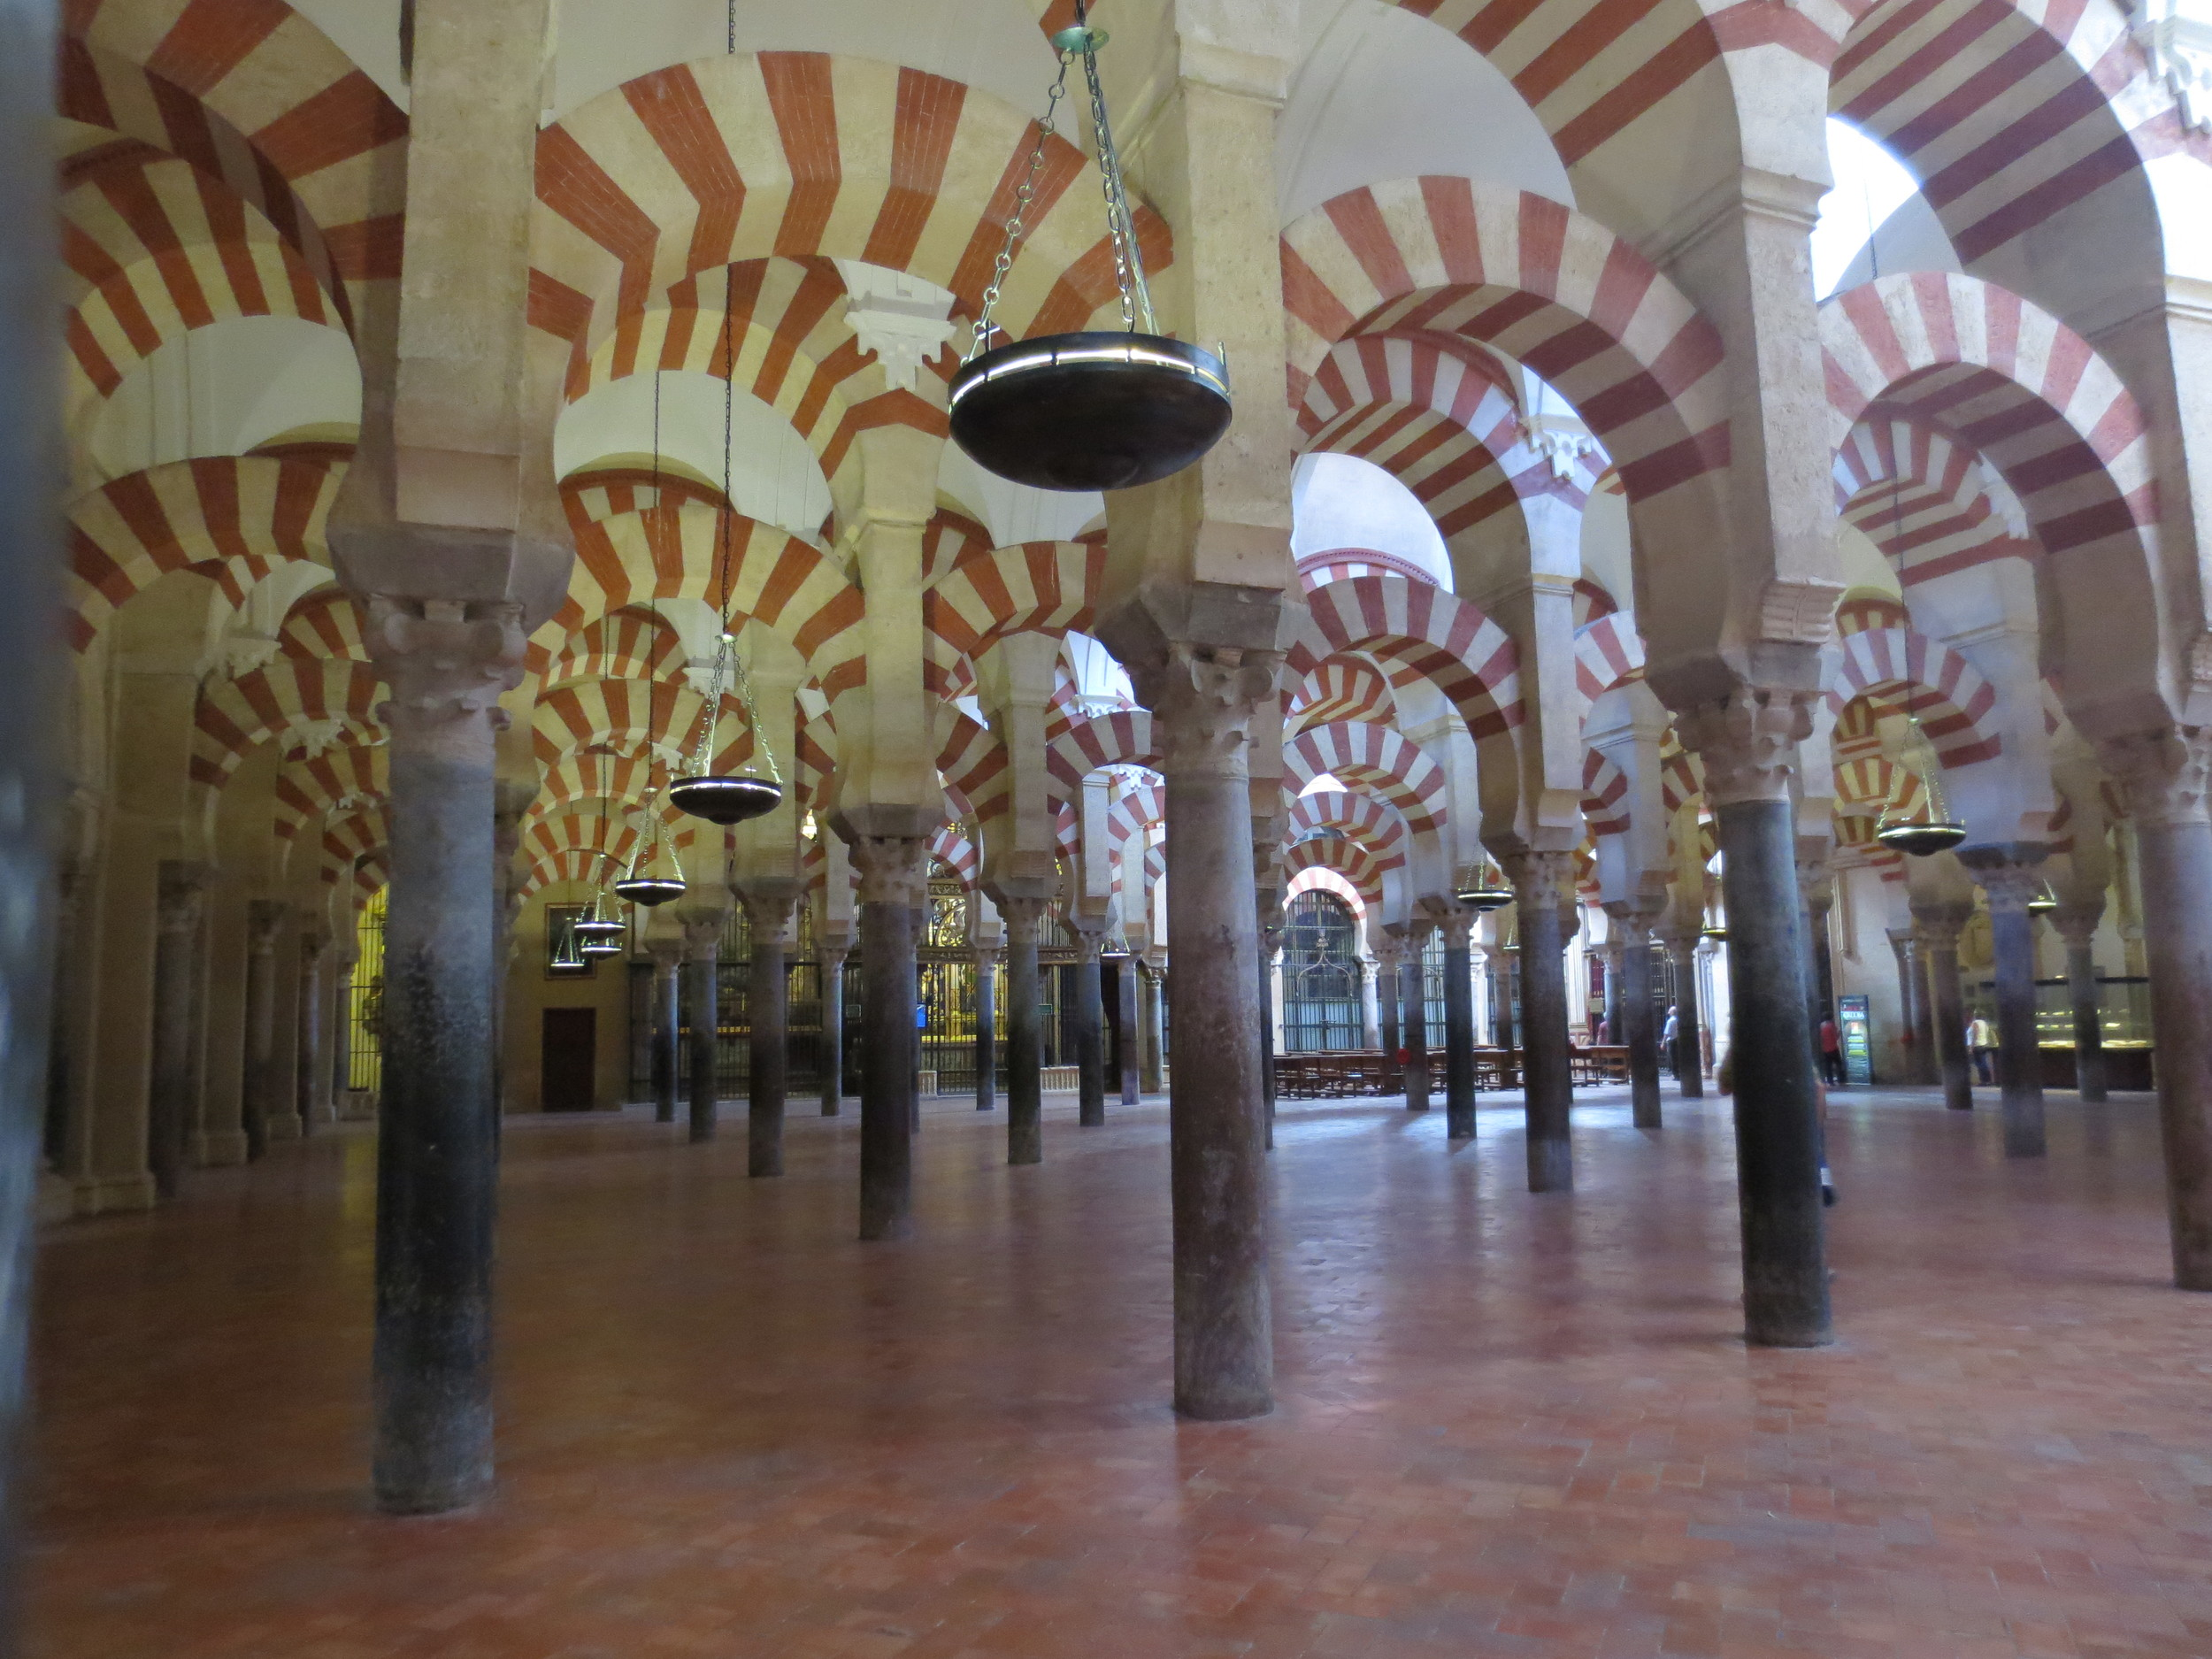 Den store Moské i Córdoba